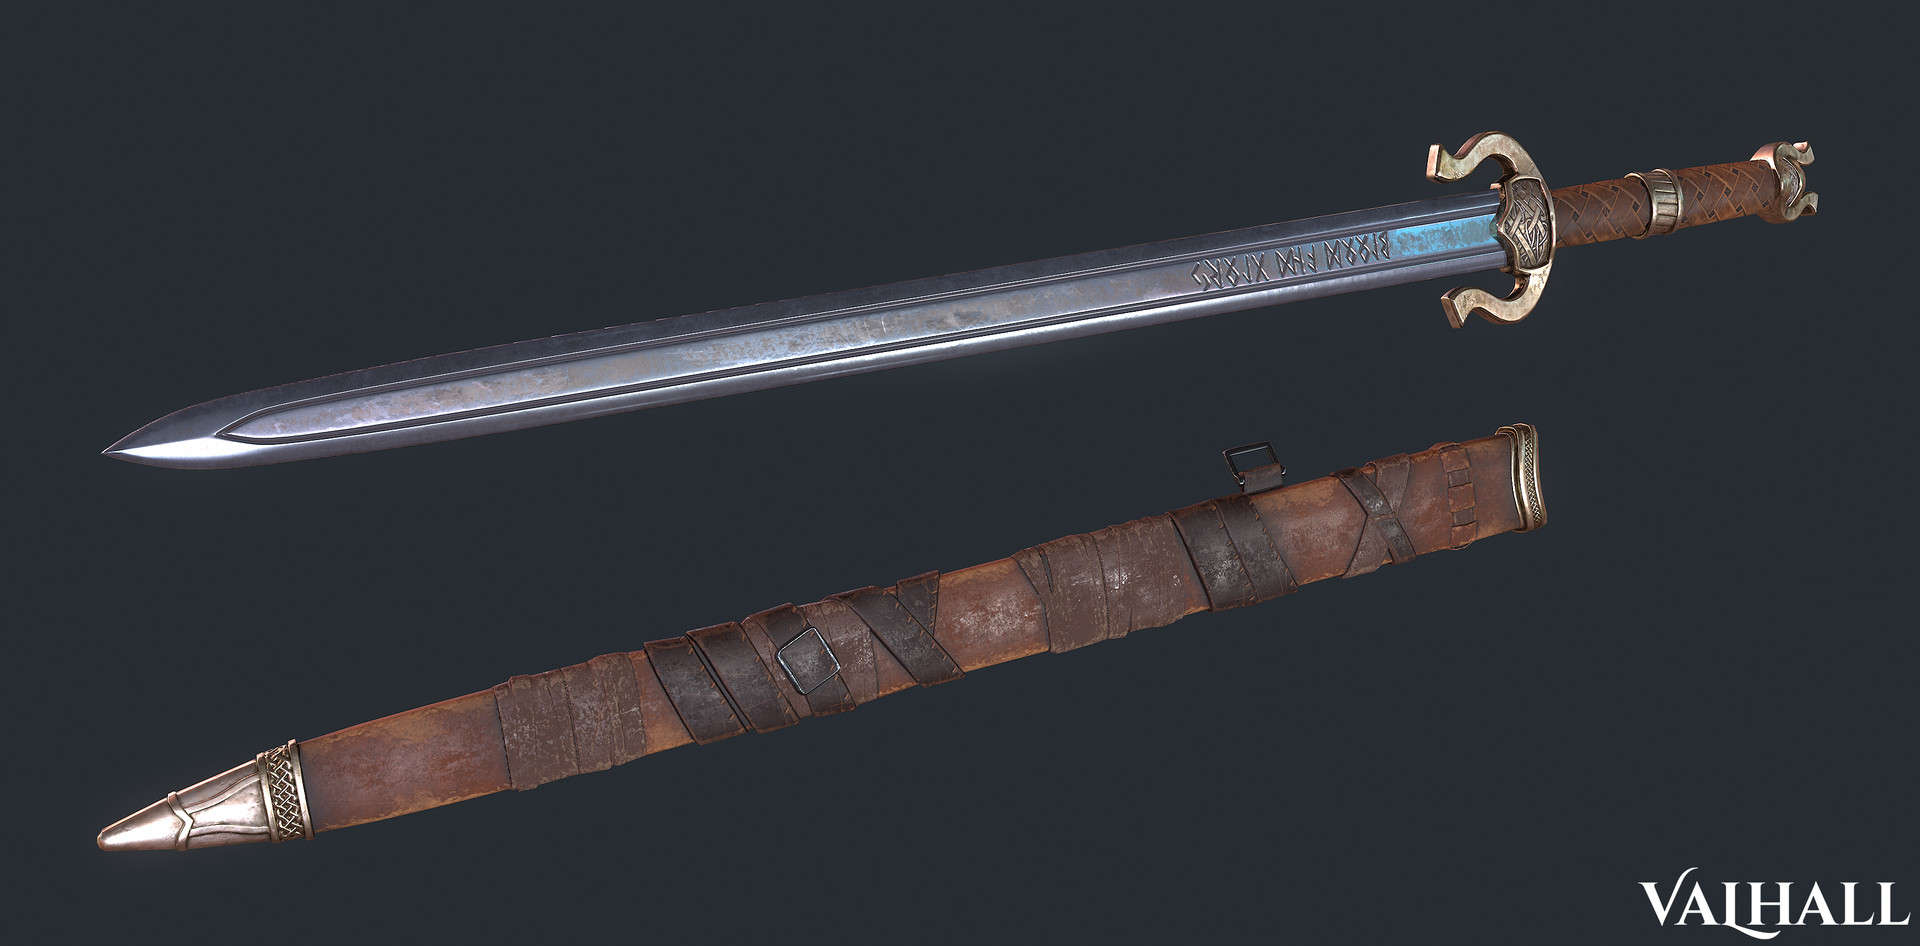 Roger perez sword02 side